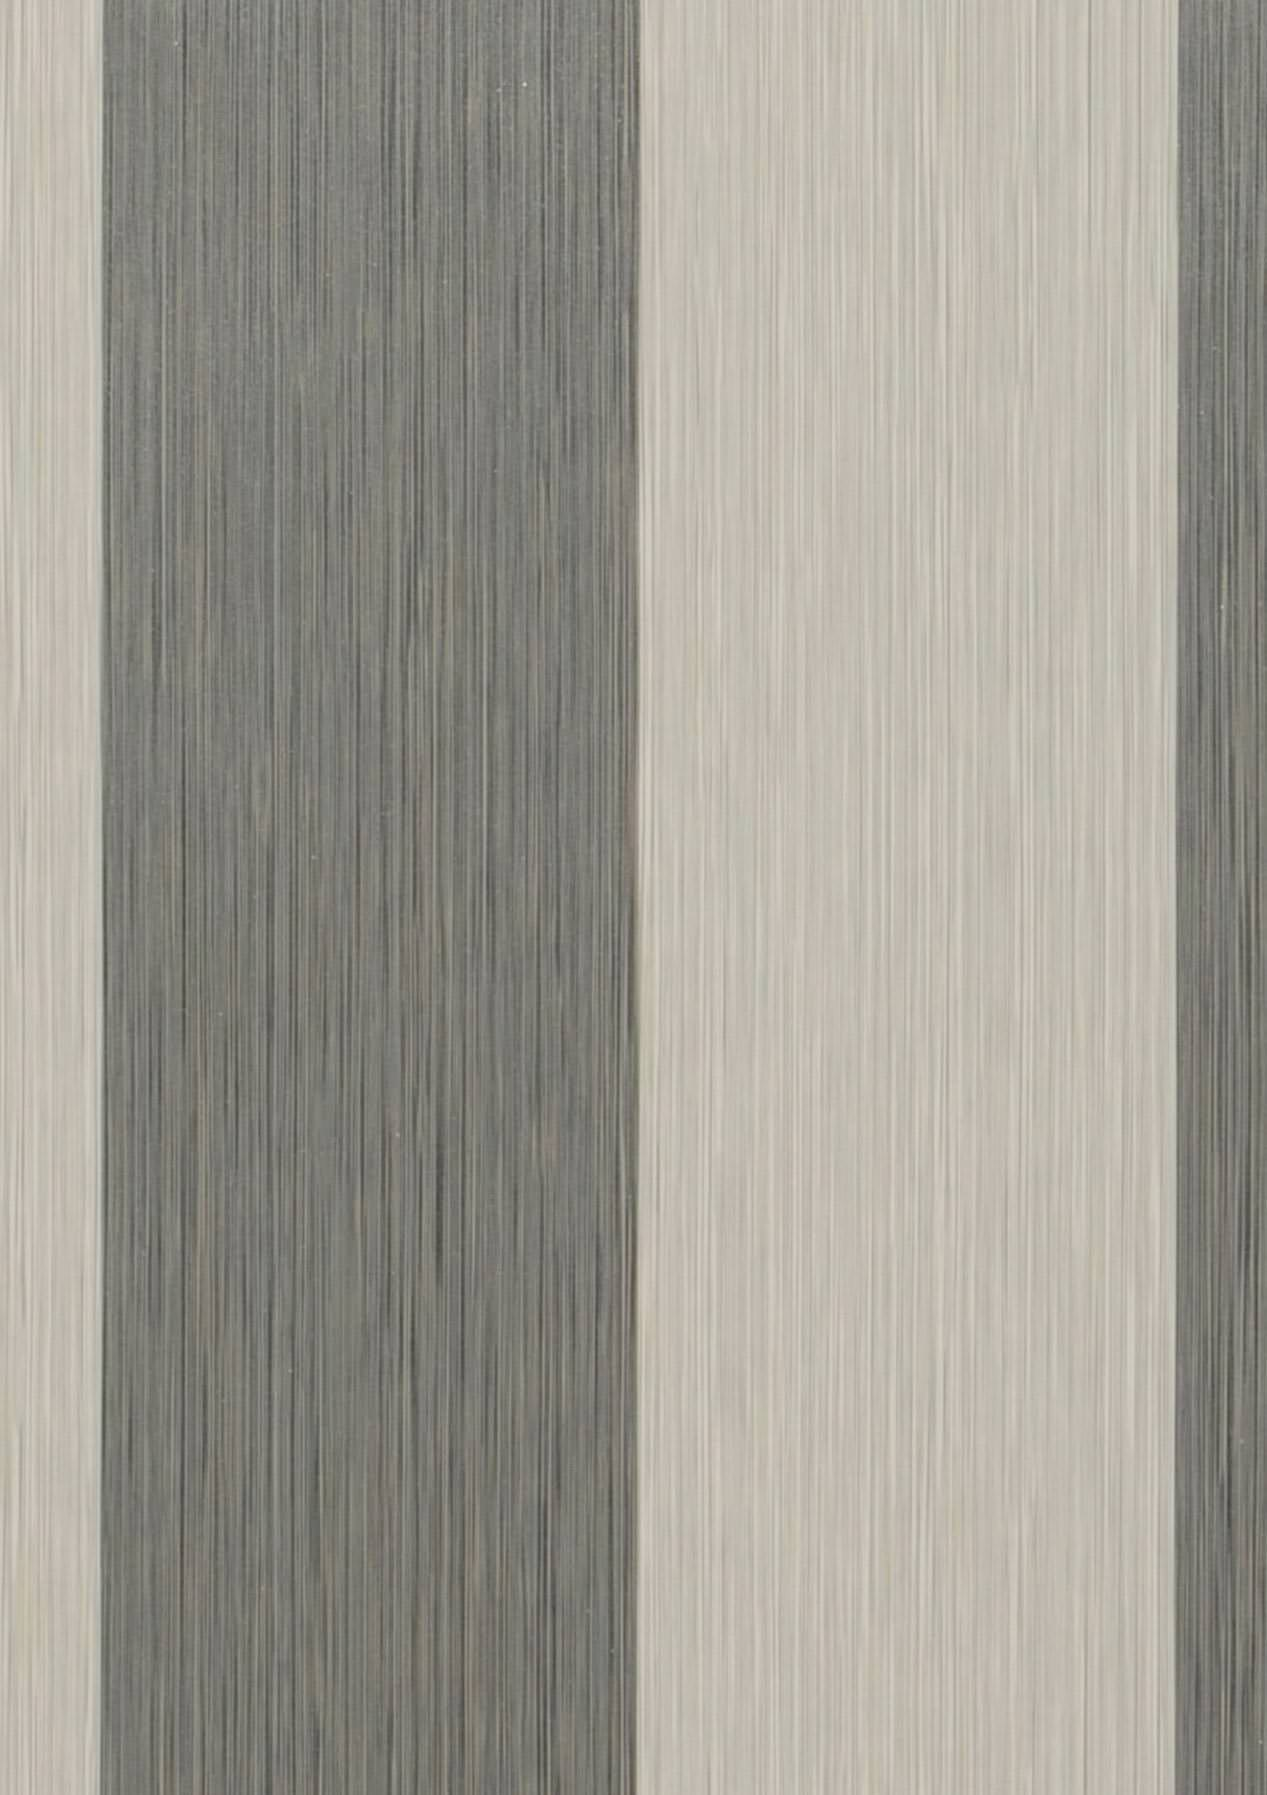 tapete mariza kieselgrau silber schimmer tapeten der 70er. Black Bedroom Furniture Sets. Home Design Ideas